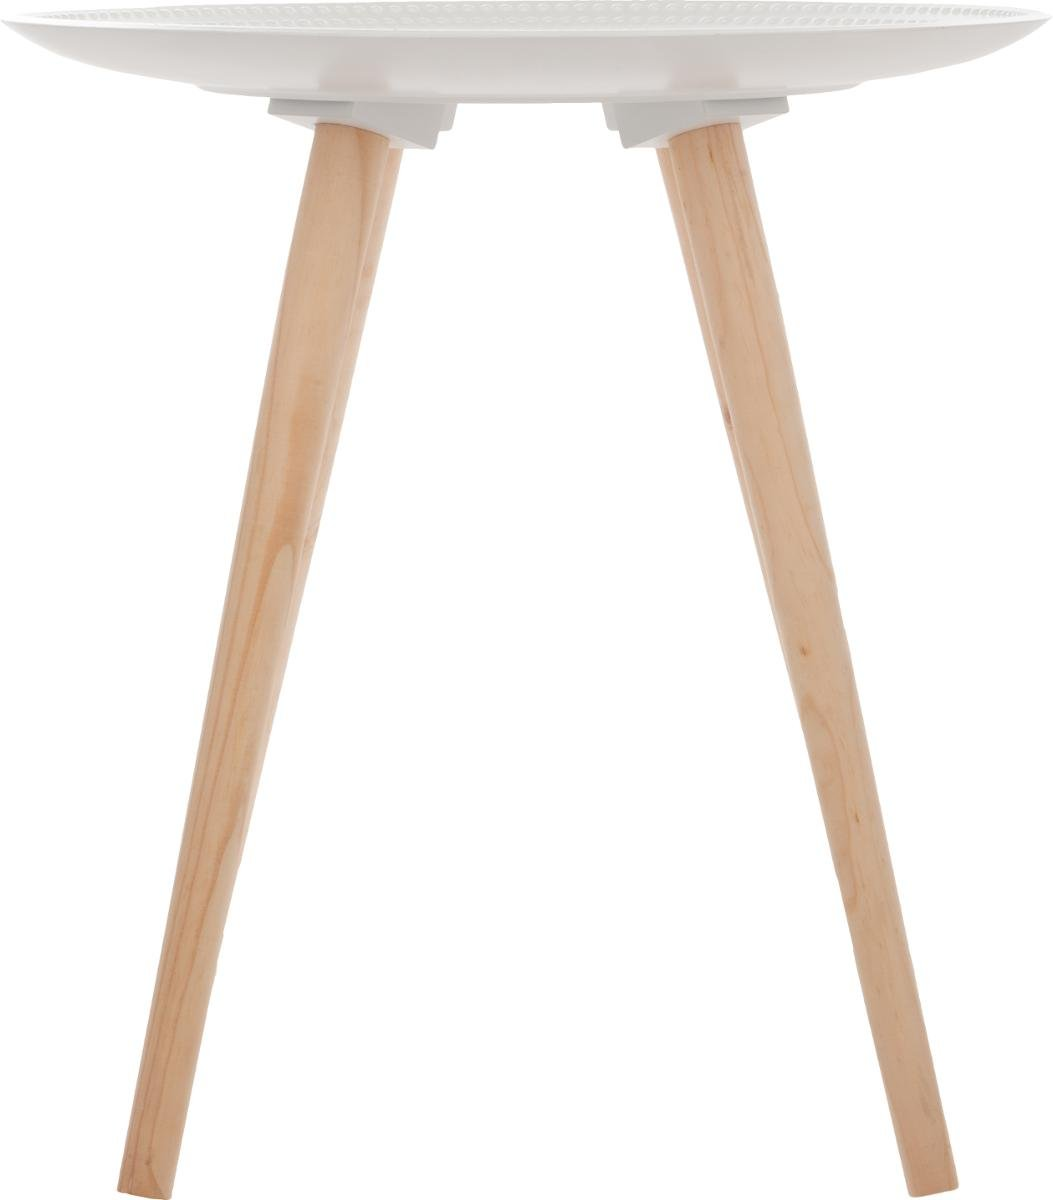 Atmosphera - Table basse tendance nomade et inspiration ...